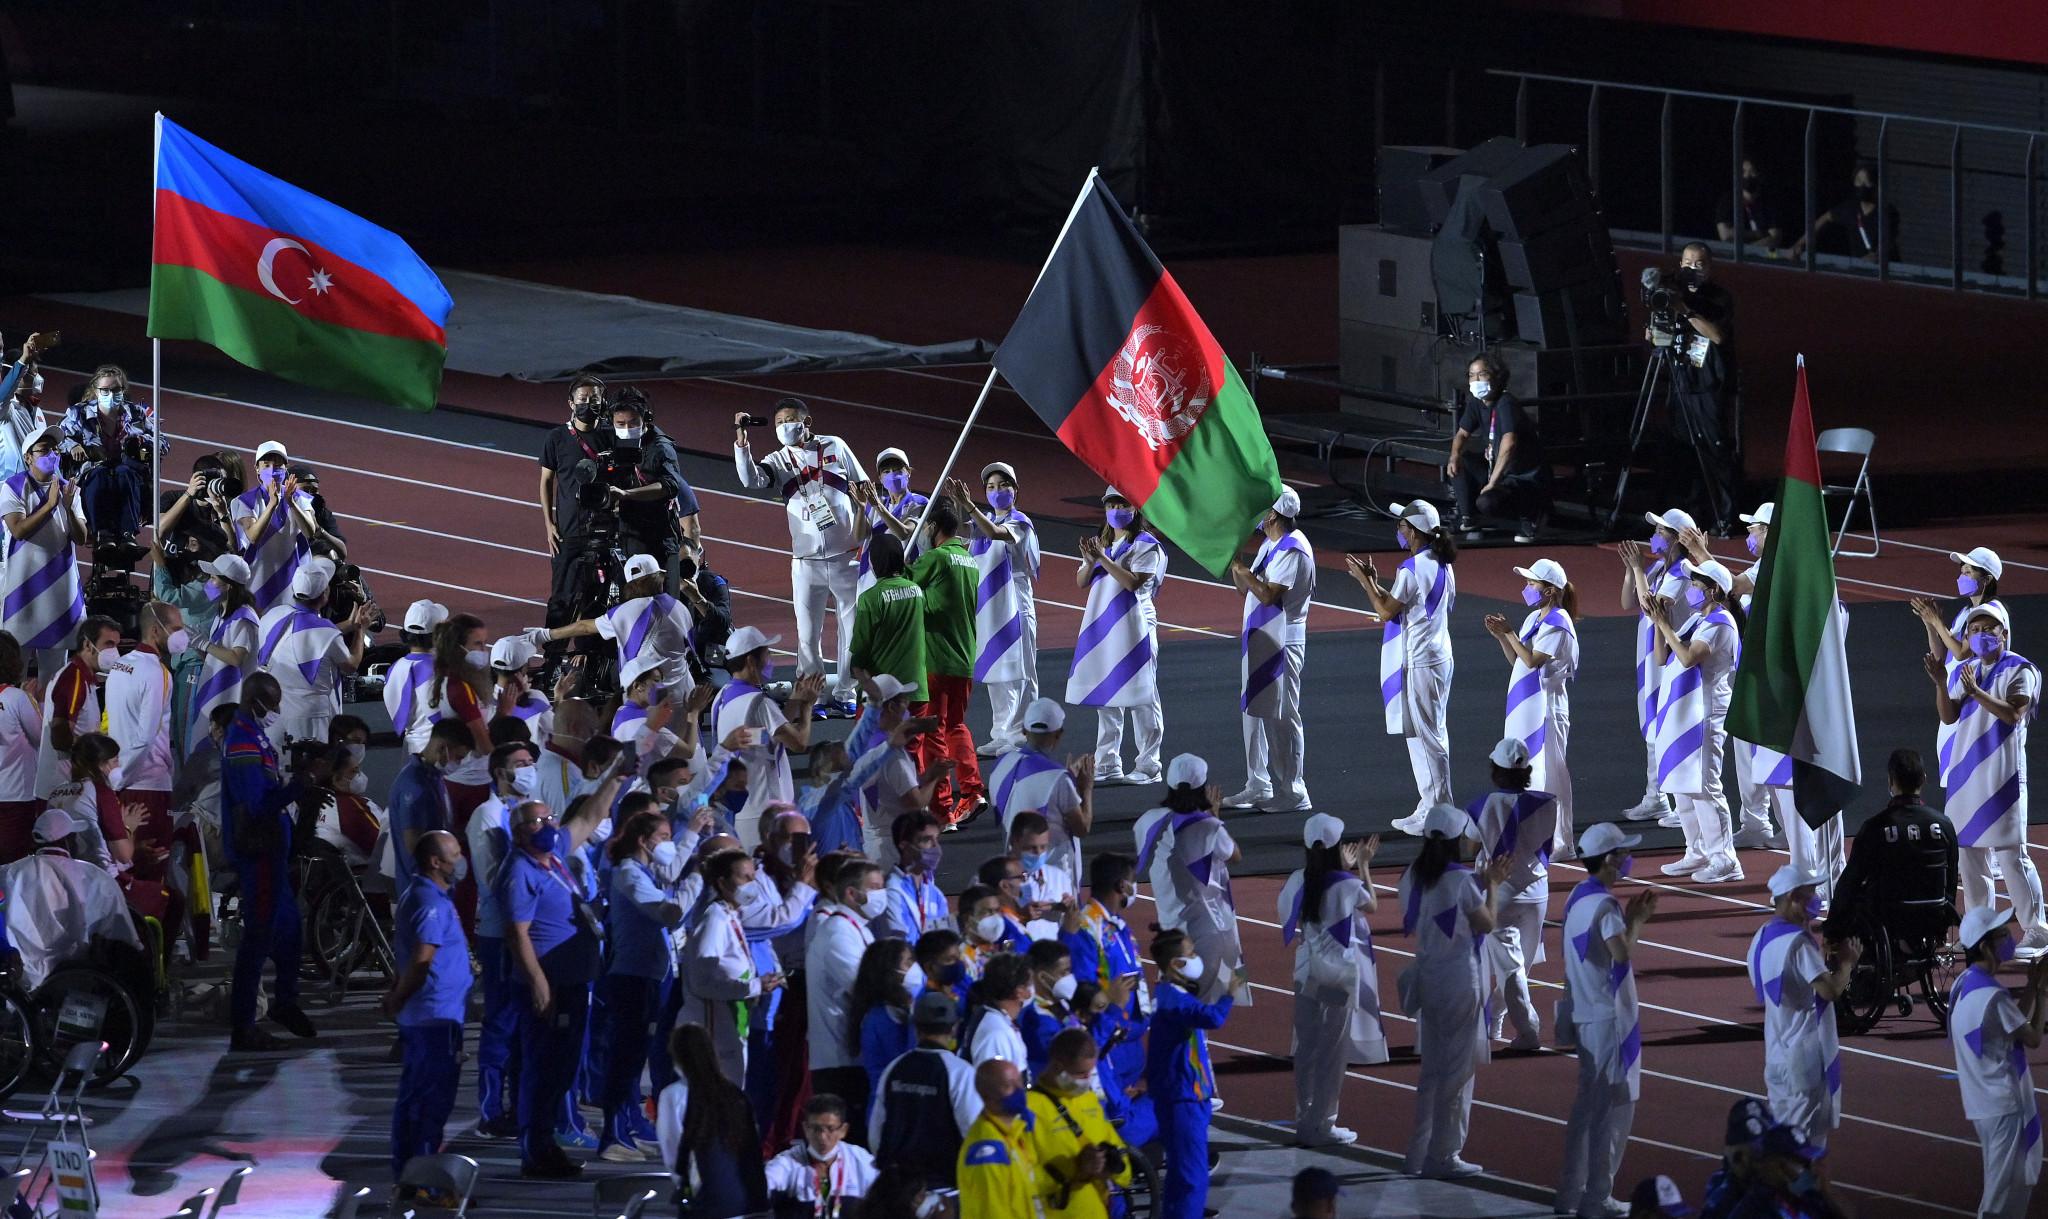 Hossain Rasouli and Zakia Khudadadi flew the flag for Afghanistan ©Getty Images